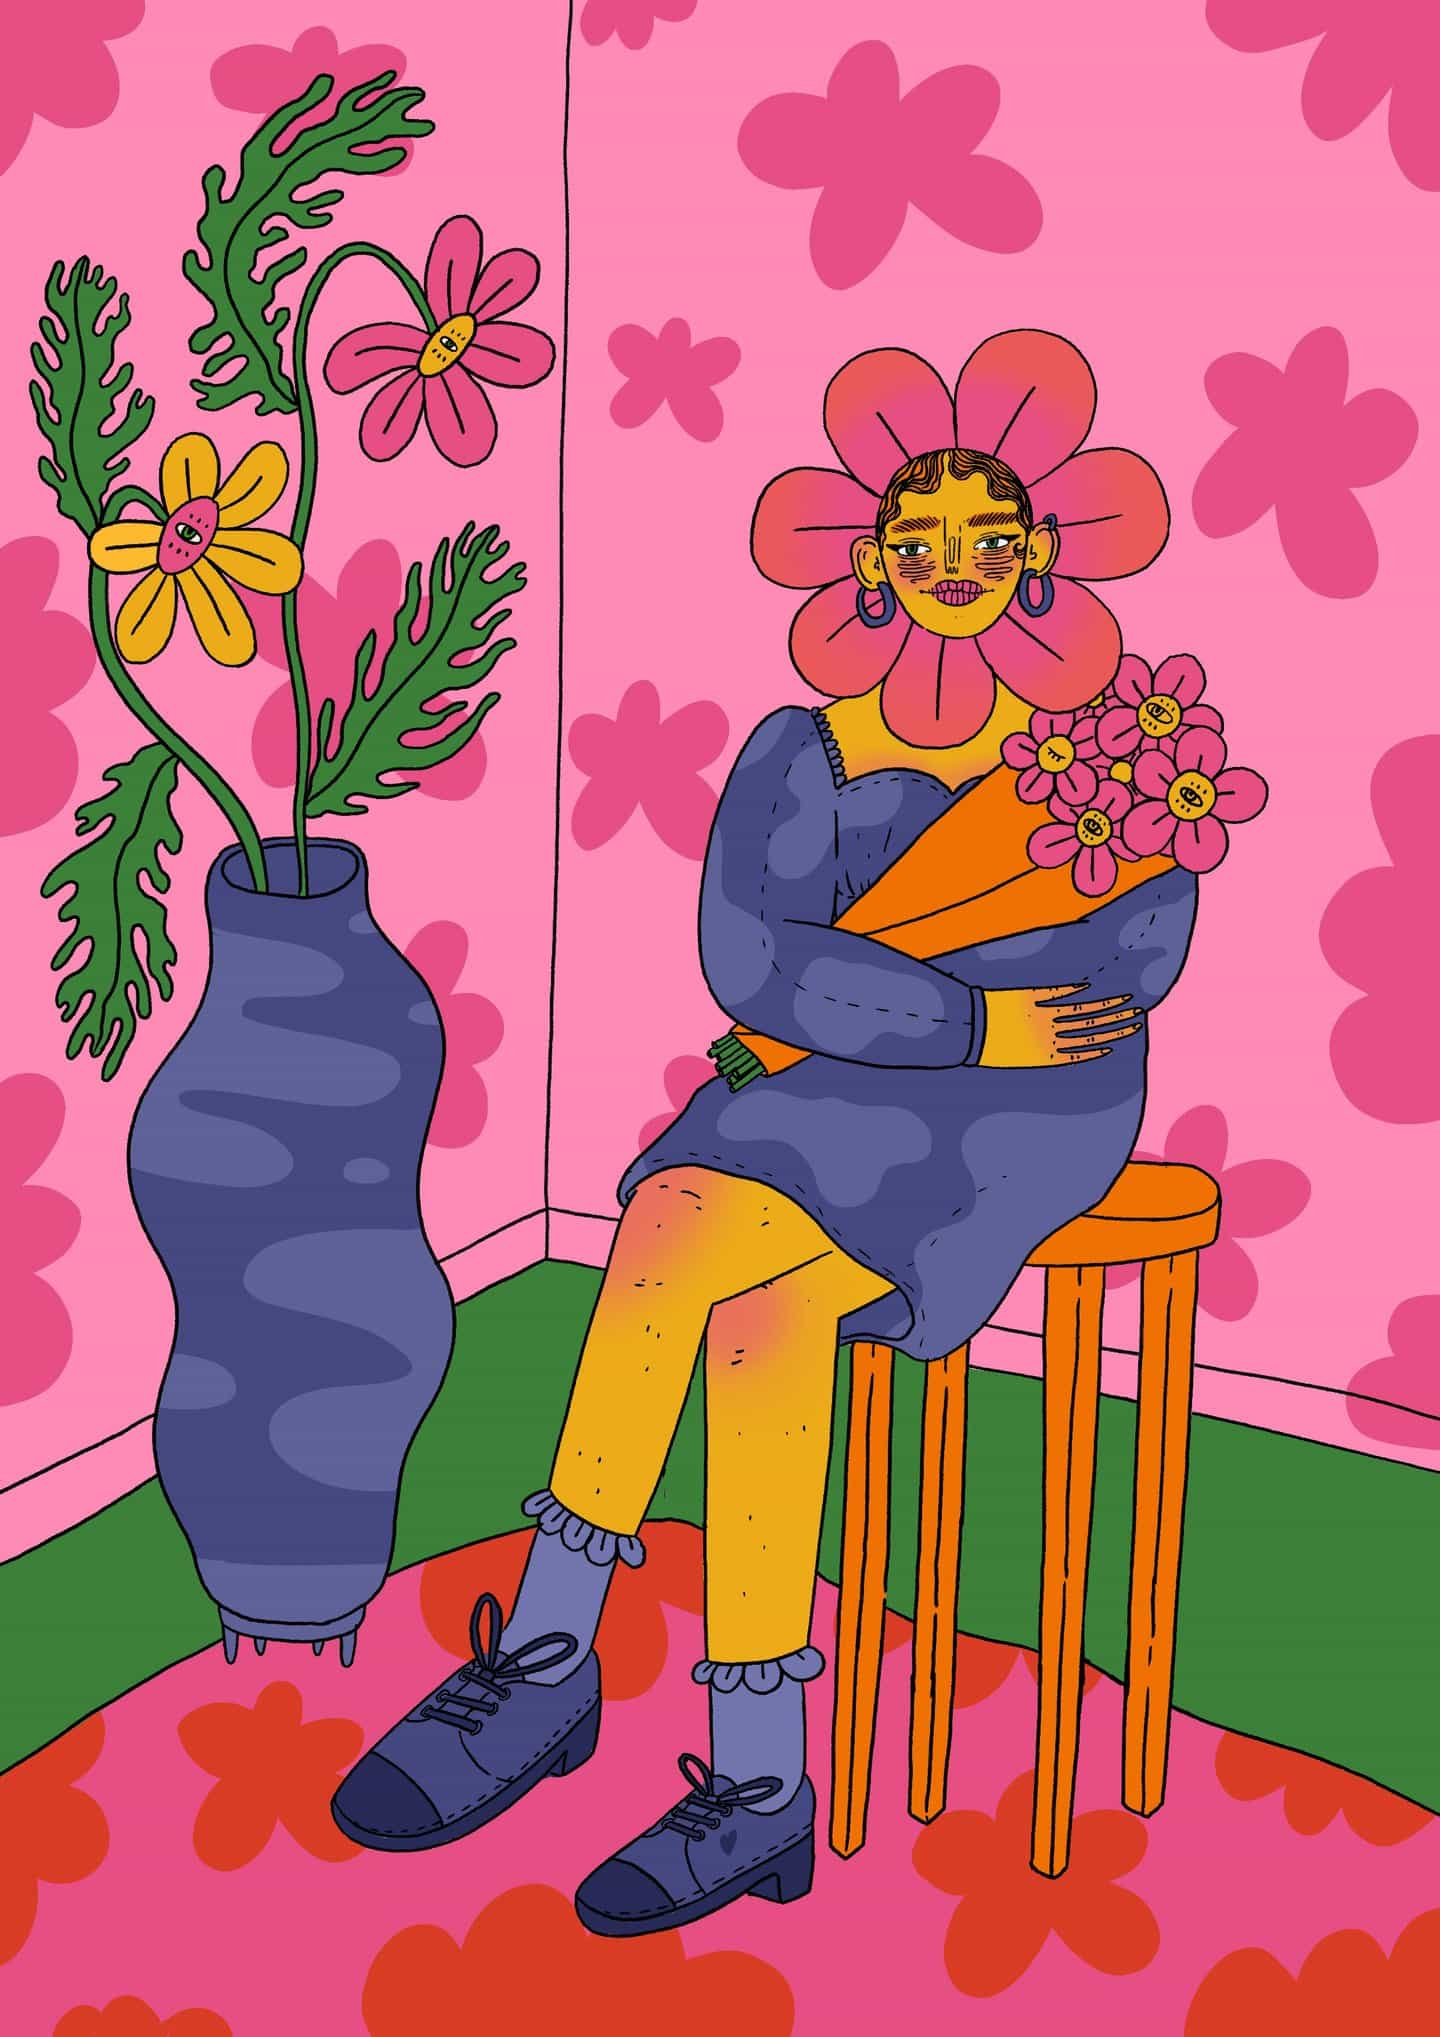 Ilustraciones de Doolittle (Eliza Williams): Cabeza de flor (Copyright © Doolittle Illustrations, enero de 2021)